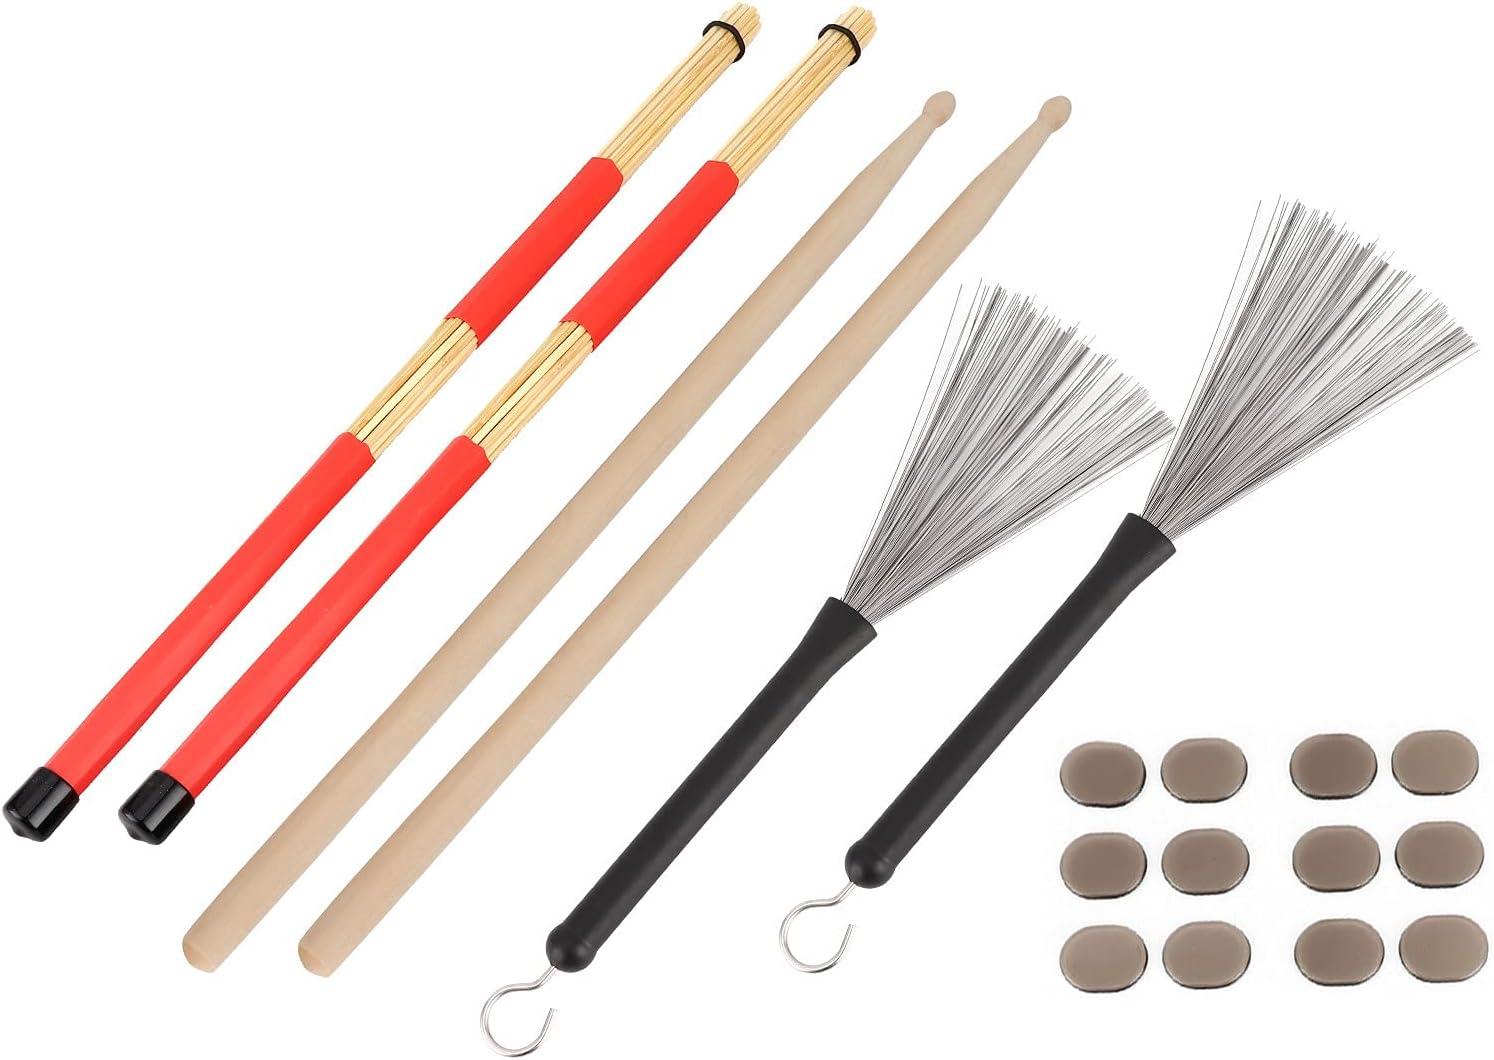 Drumstick Kit 5 ☆ popular Tucson Mall Rute Brush Damper Musical Set Instrument Play Drum